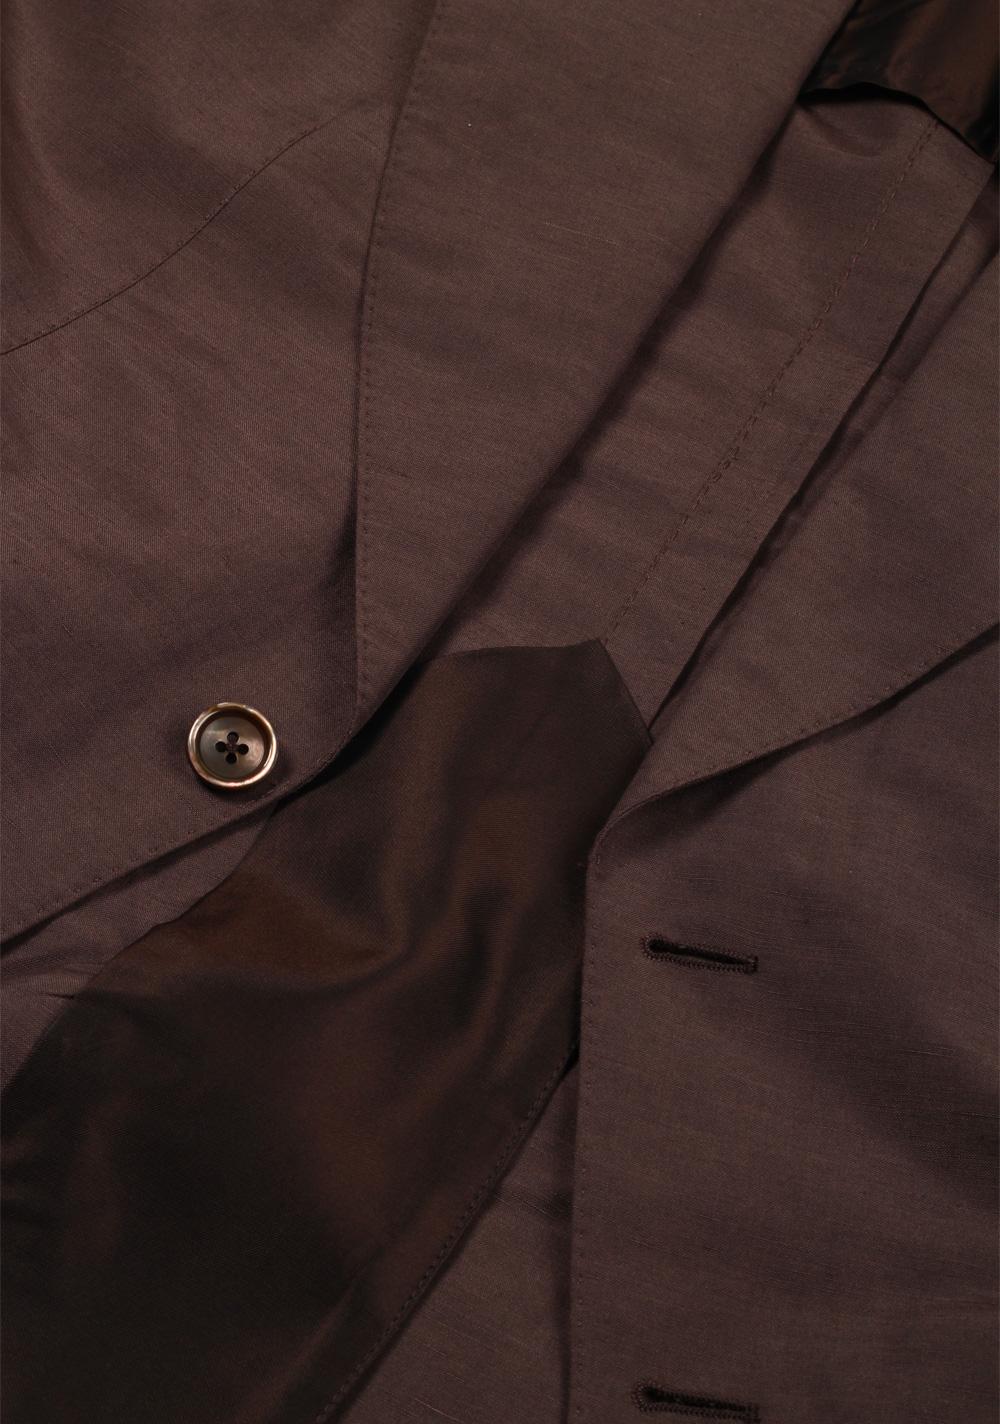 TOM FORD Atticus Brown Suit Size 46 / 36R U.S. In Silk Linen | Costume Limité